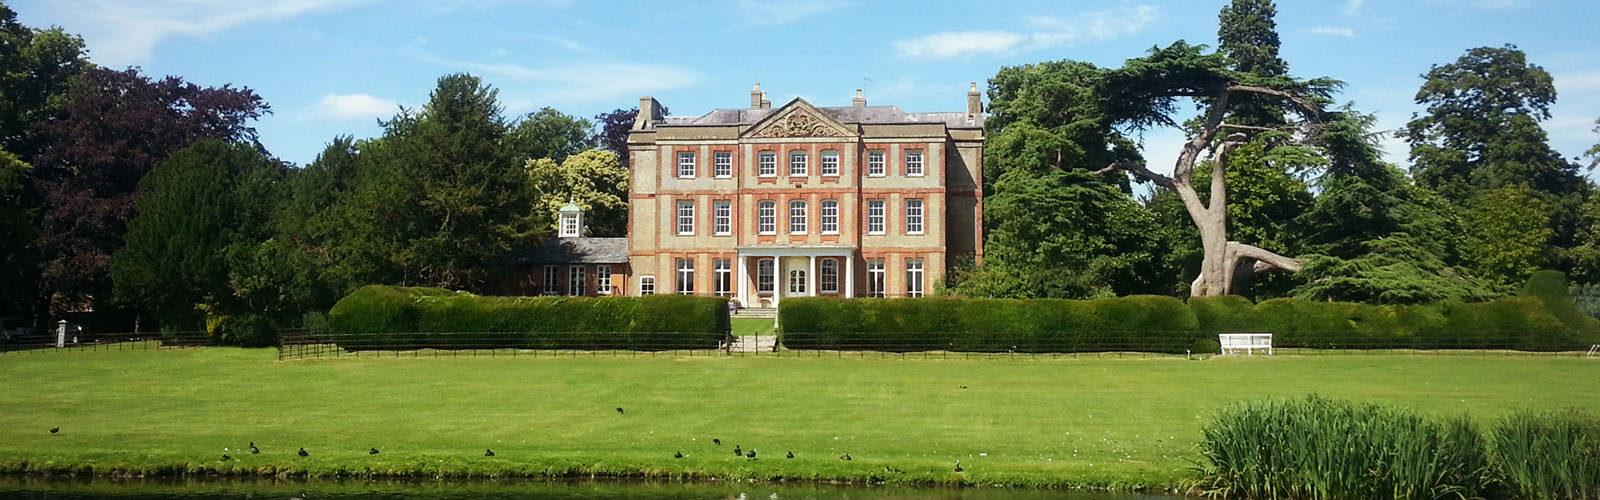 luxury manor house with lake.